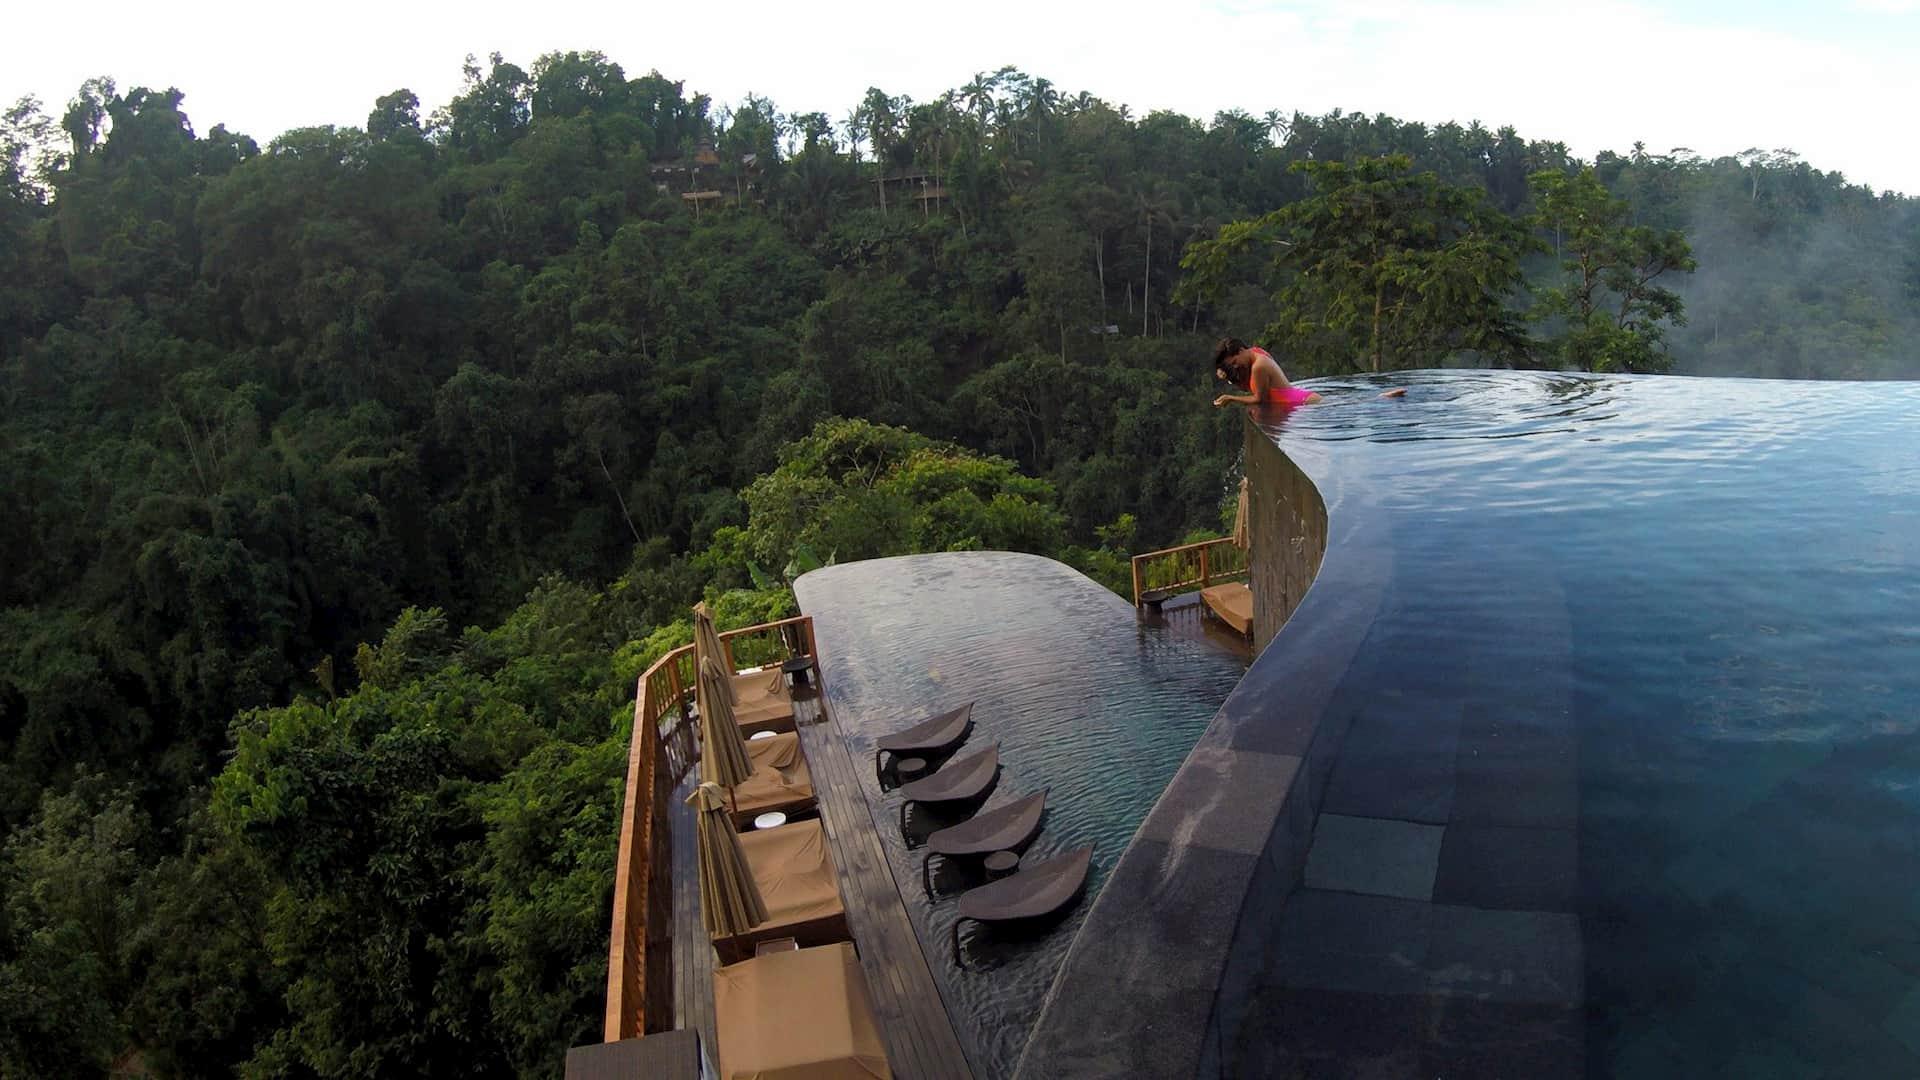 Viaggio di nozze a Giugno Resort Hanging Garden